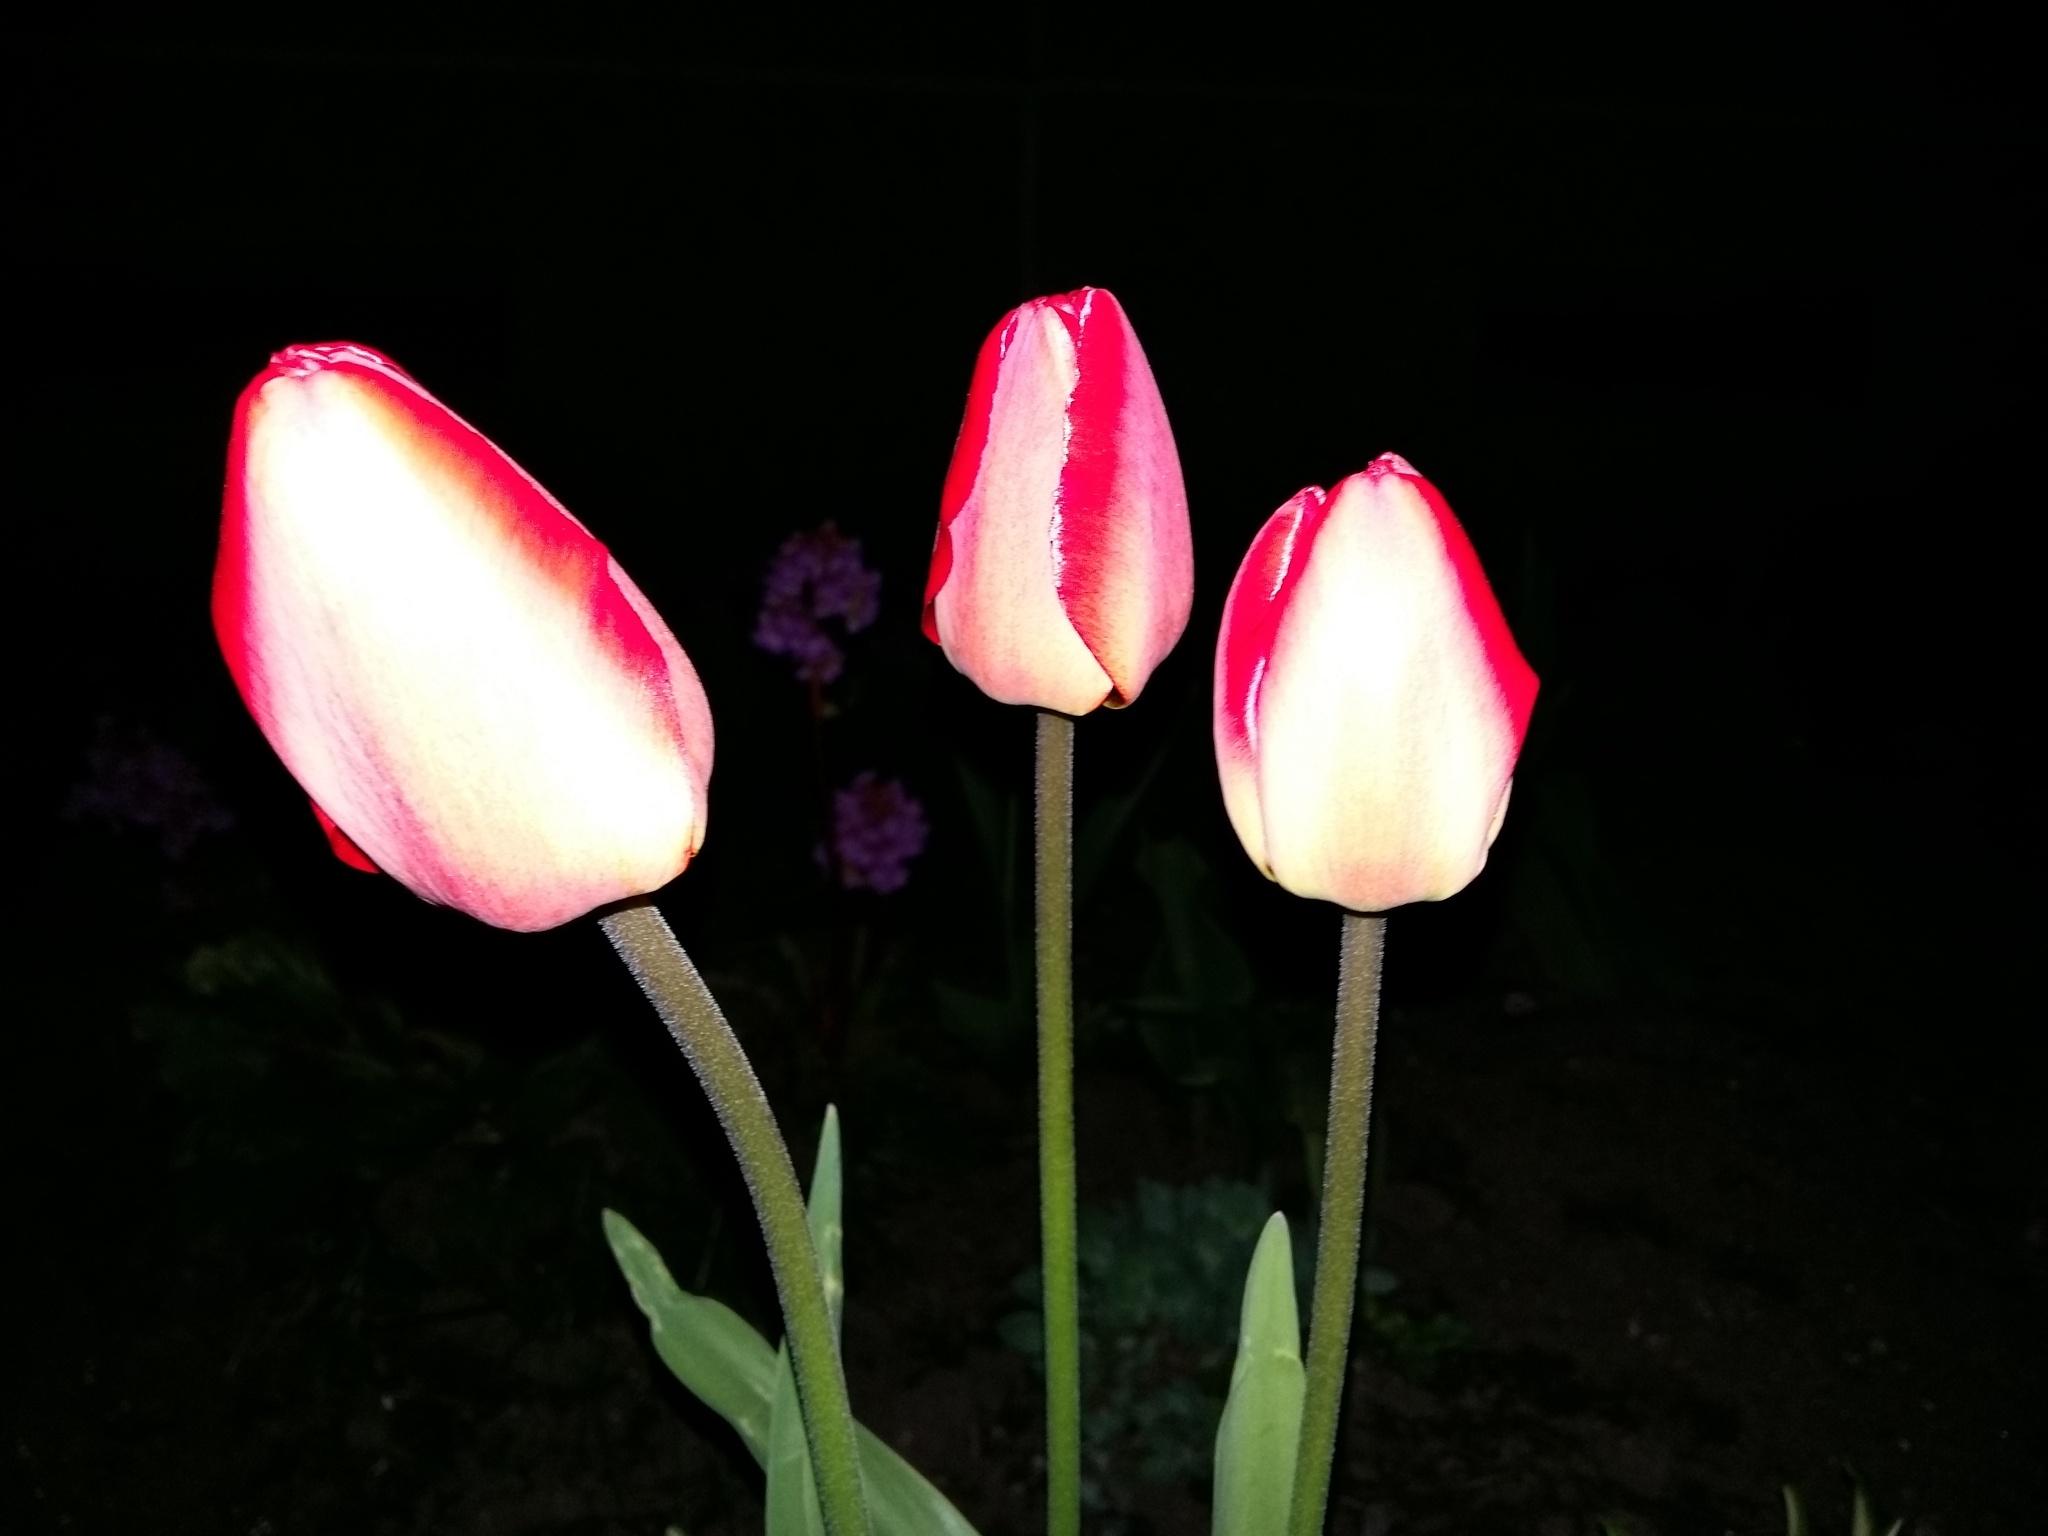 Tulips at night by uzkuraitiene62